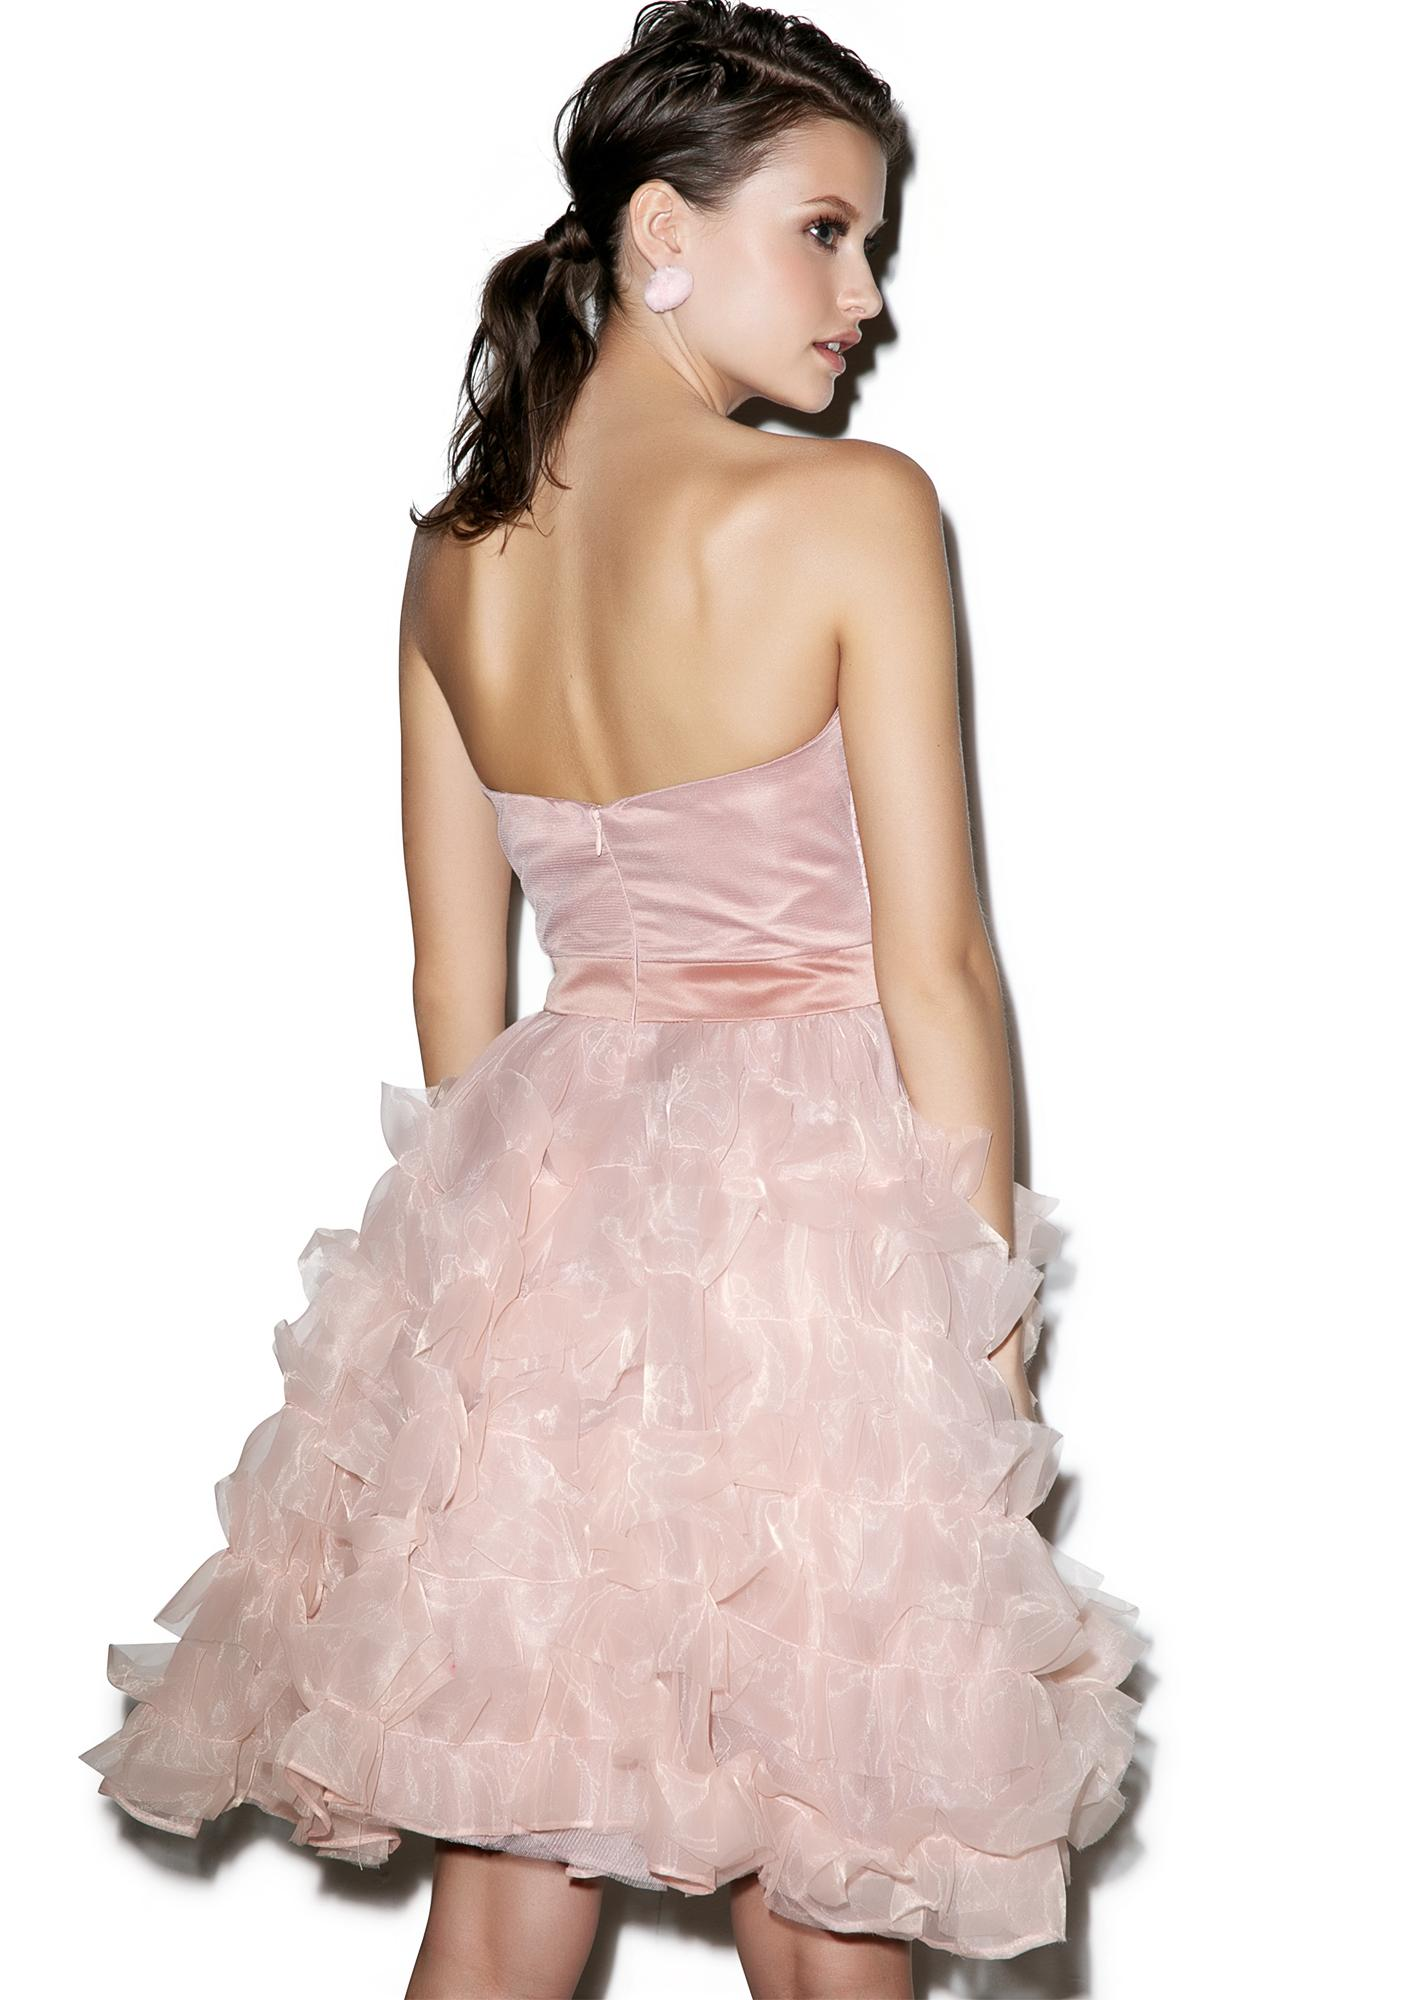 Glamorous Rose Bride Ruffled Dress